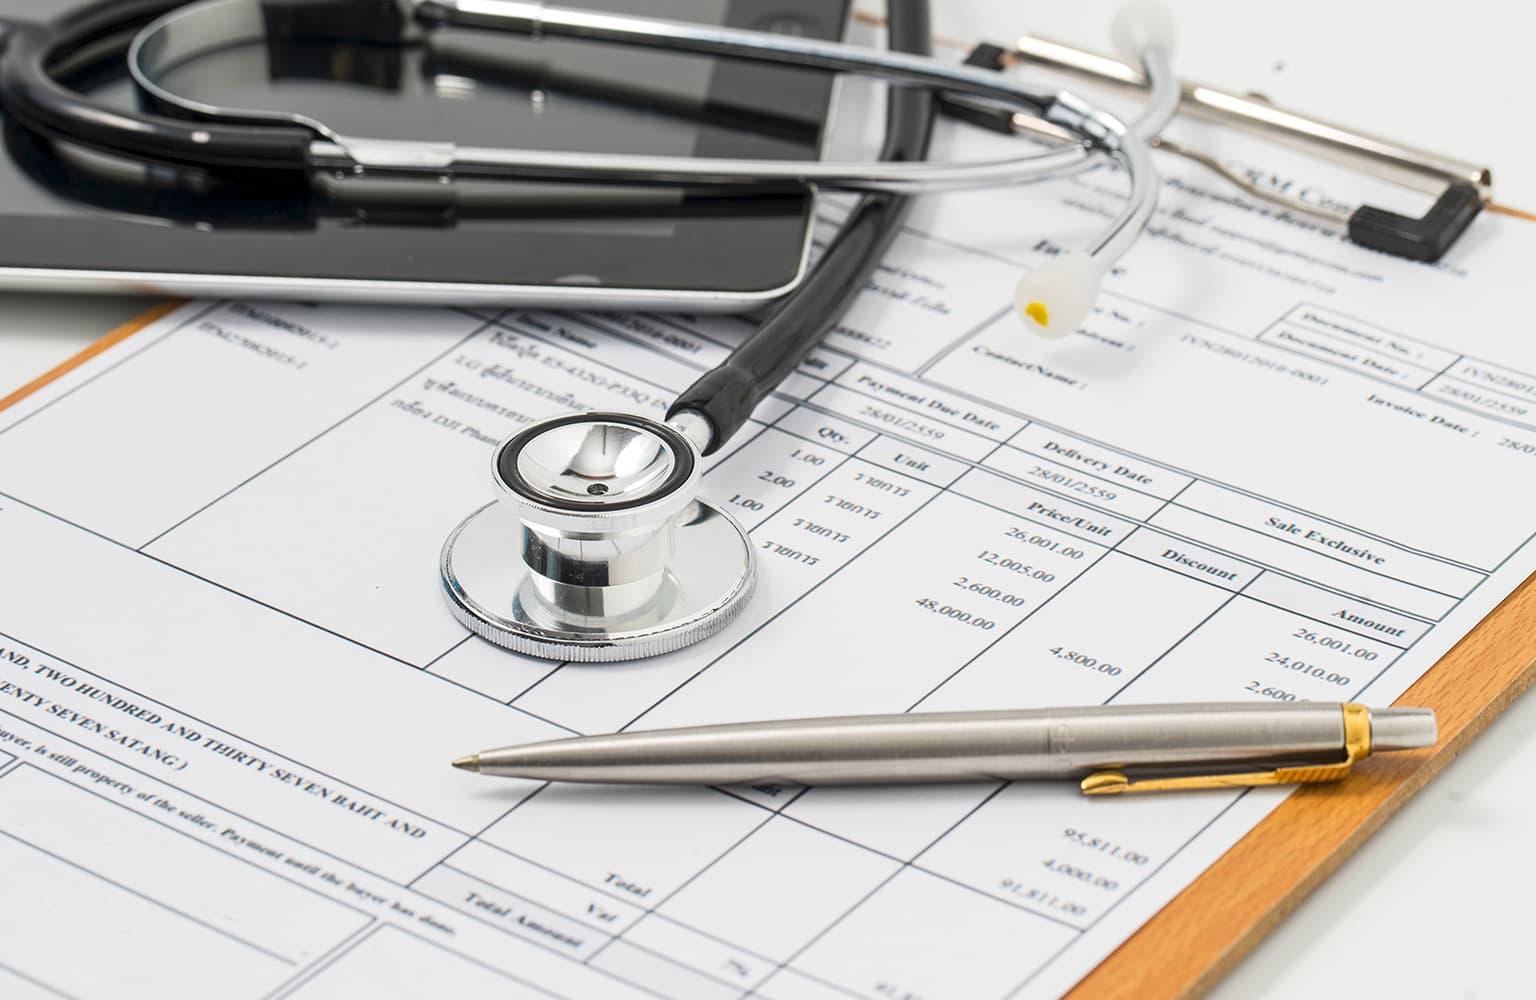 24/7 Registered Nursing